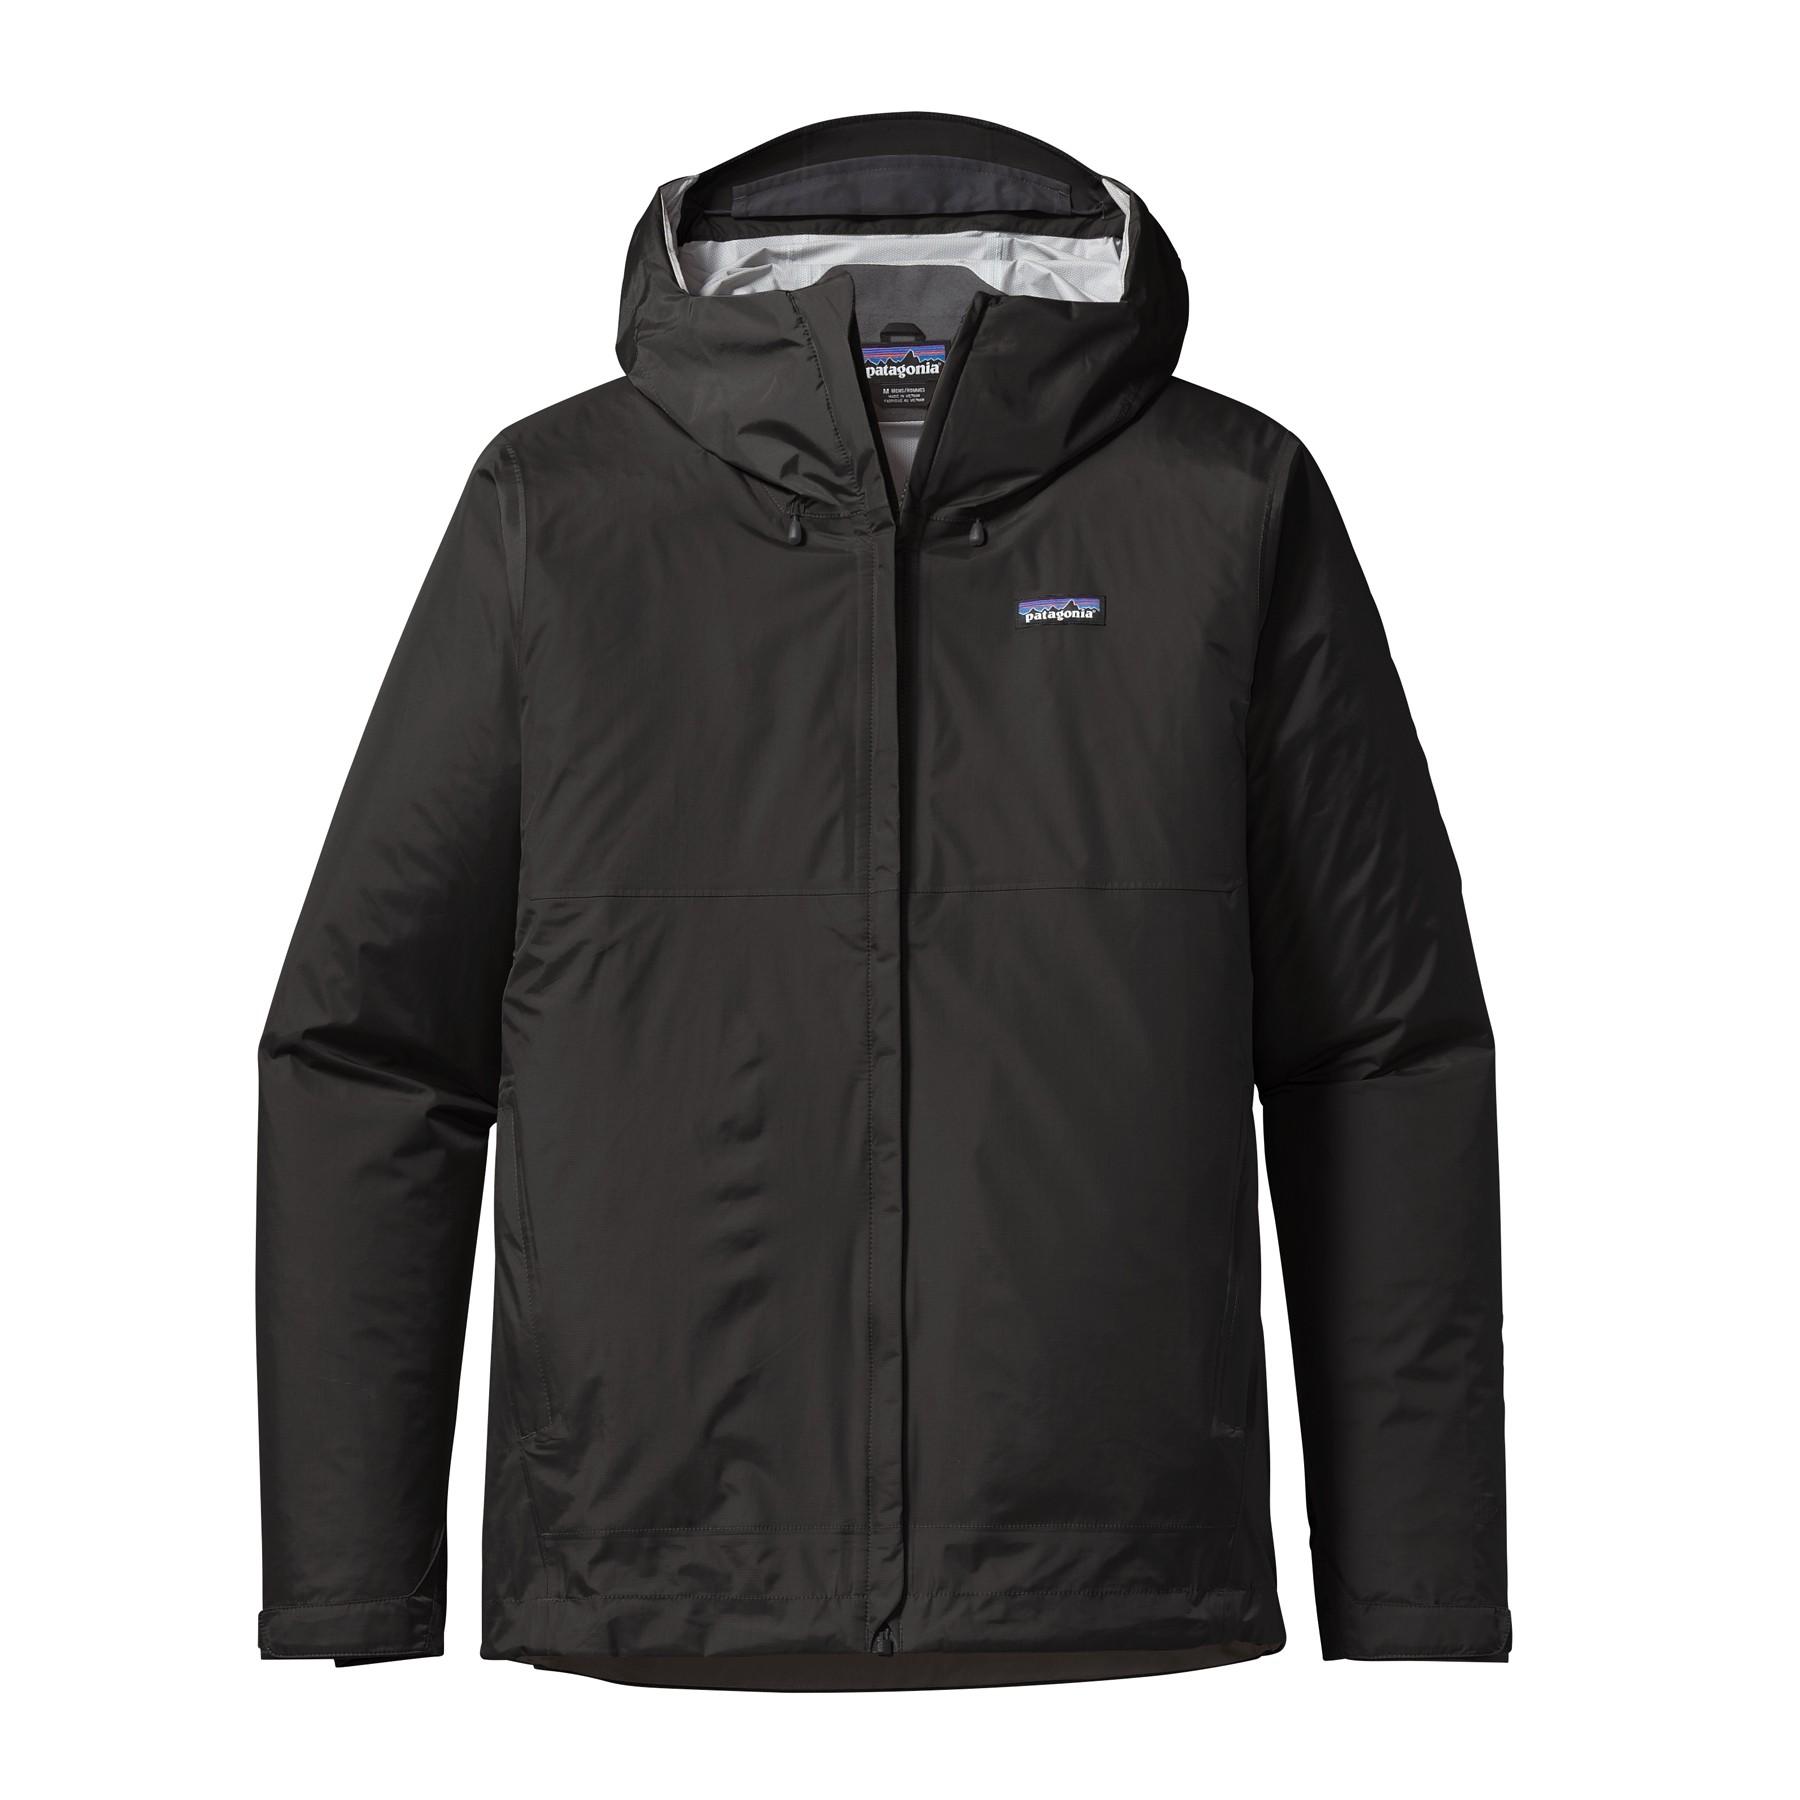 Patagonia Mens Torrentshell Jacket : Black